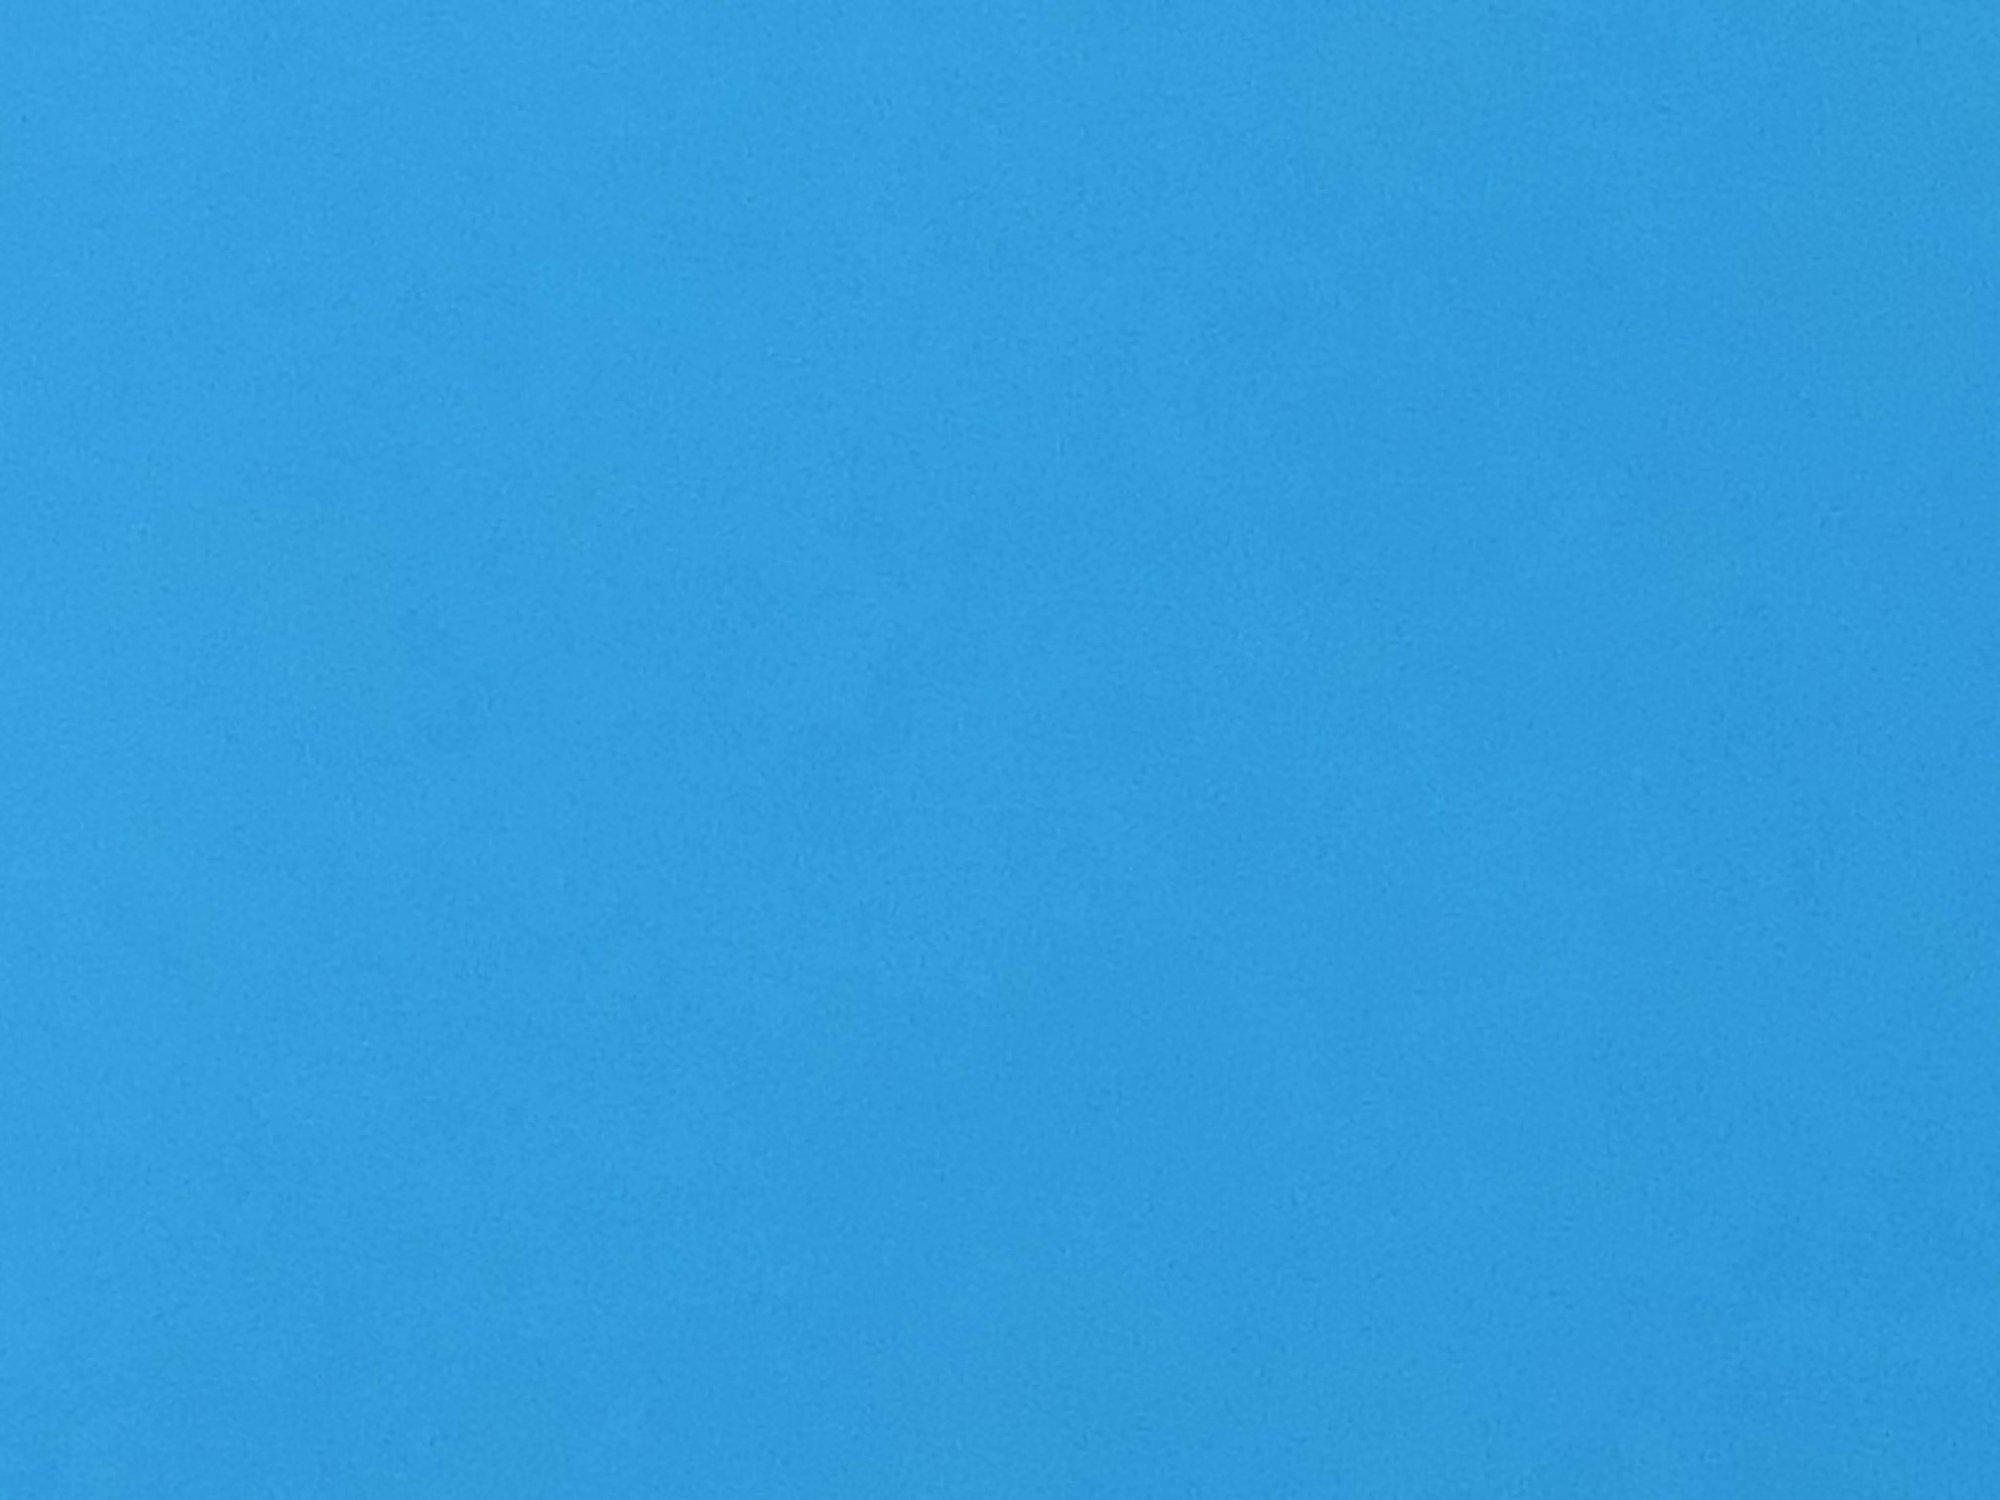 Stahls' Light Blue Fashion-Film Heat Transfer Vinyl 12 x 15